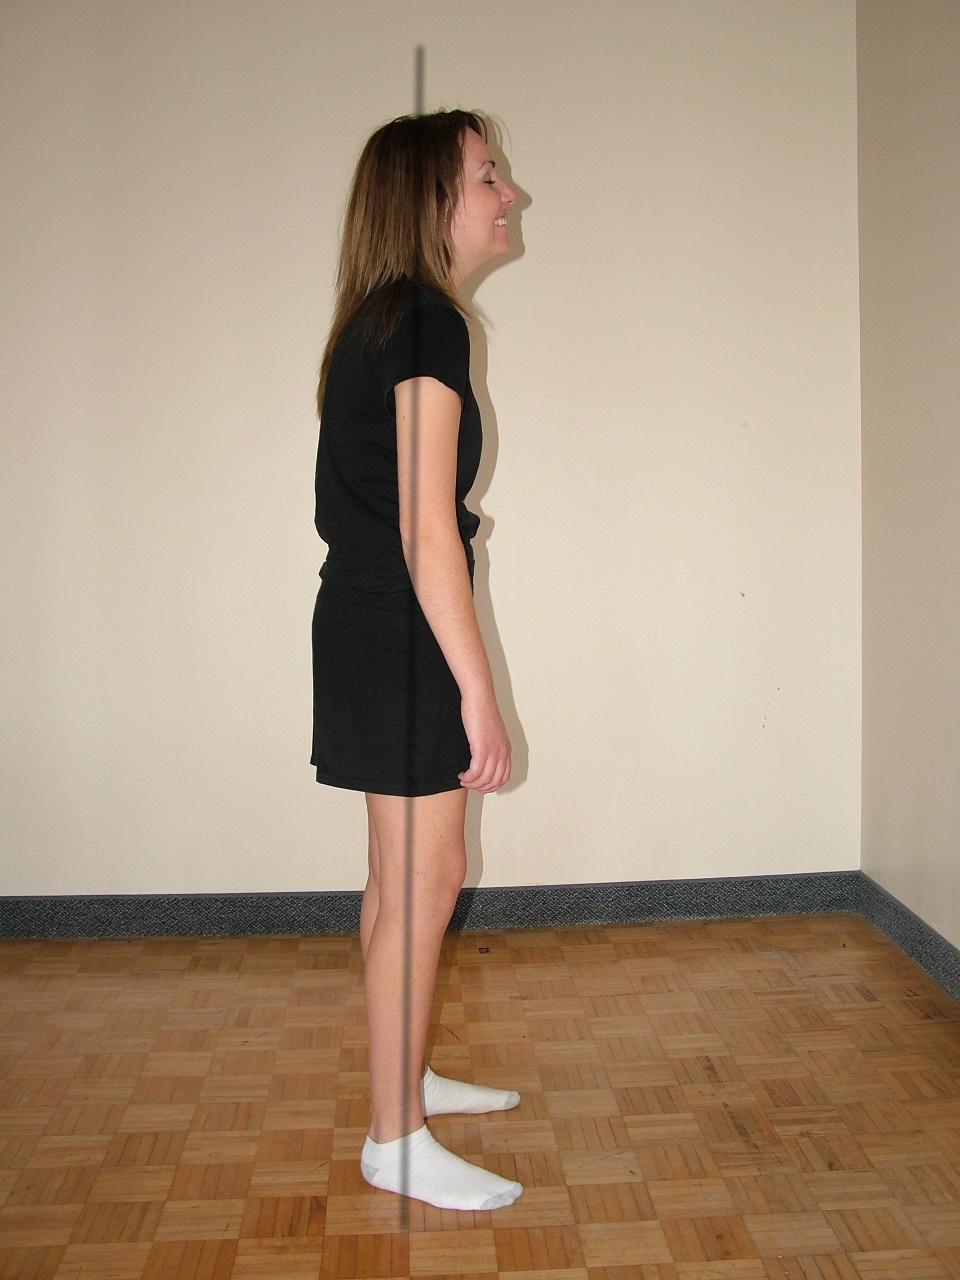 Kyphotic Posture Example